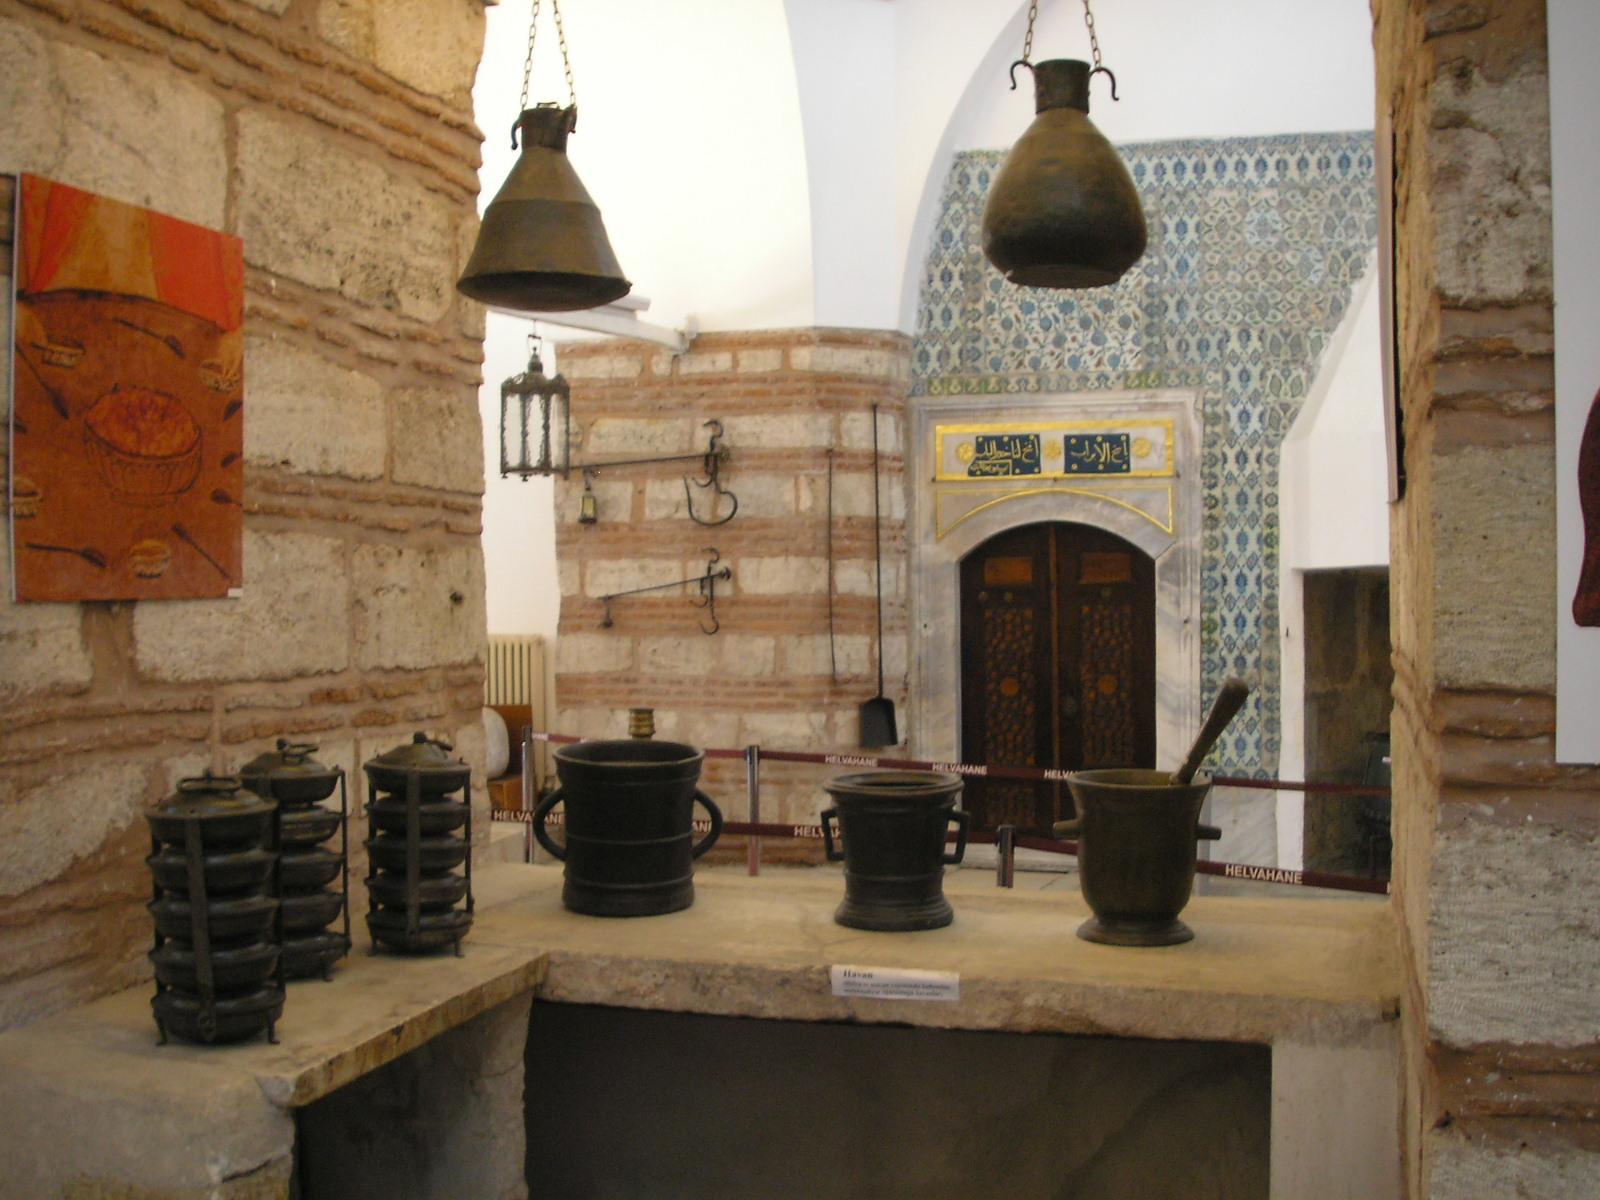 File:Palace kitchens Topkapi 2007 024b.jpg - Wikimedia Commons